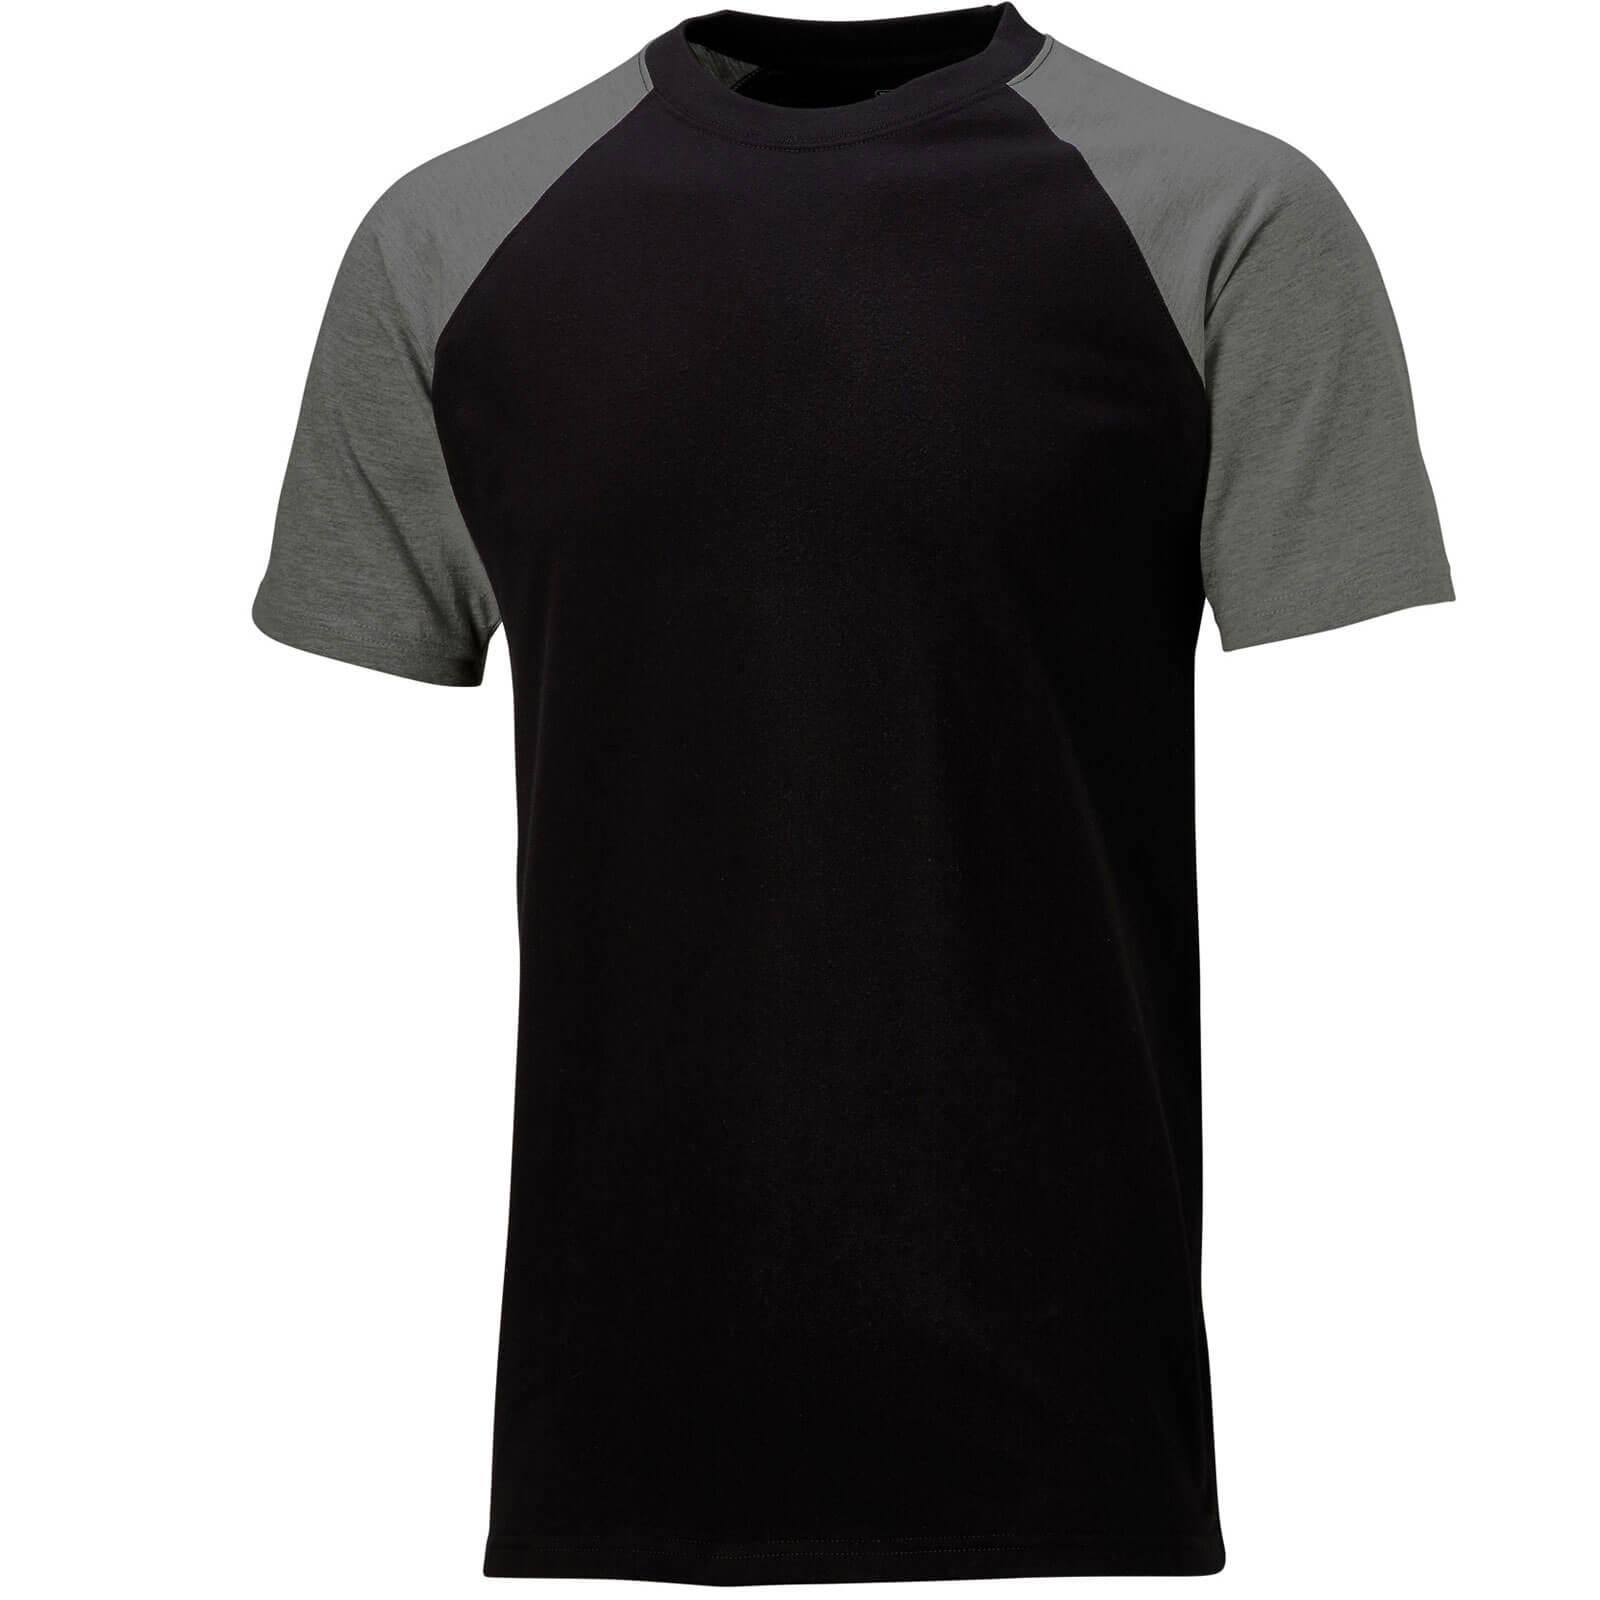 Dickies Two Tone T-Shirt Black  Grey 2XL